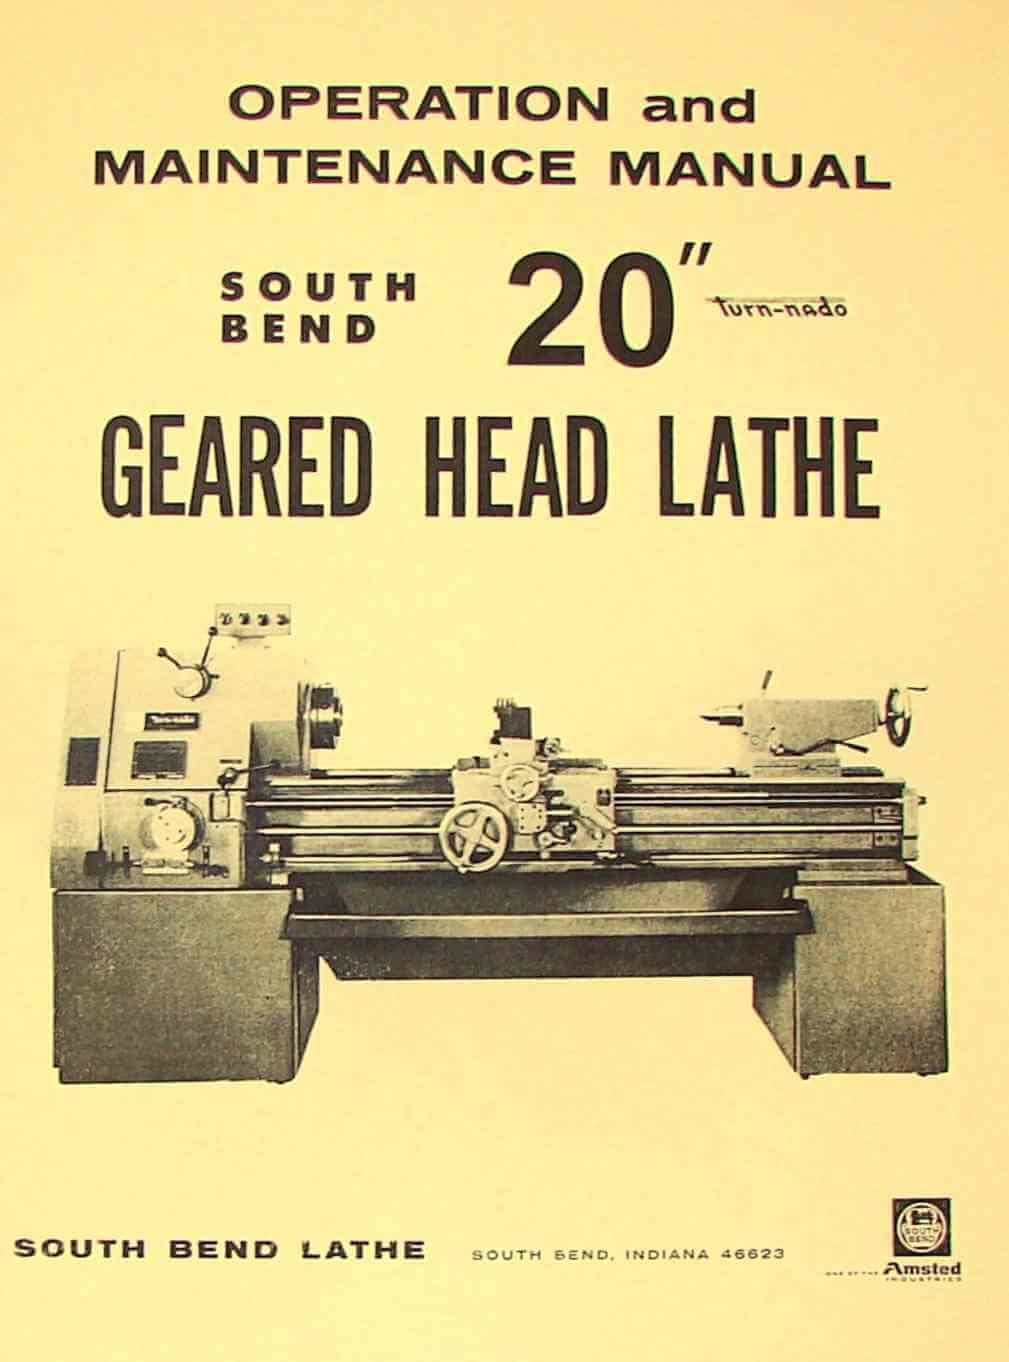 SOUTH BEND 20 Turn-nado Gear Lathe Operators Manual